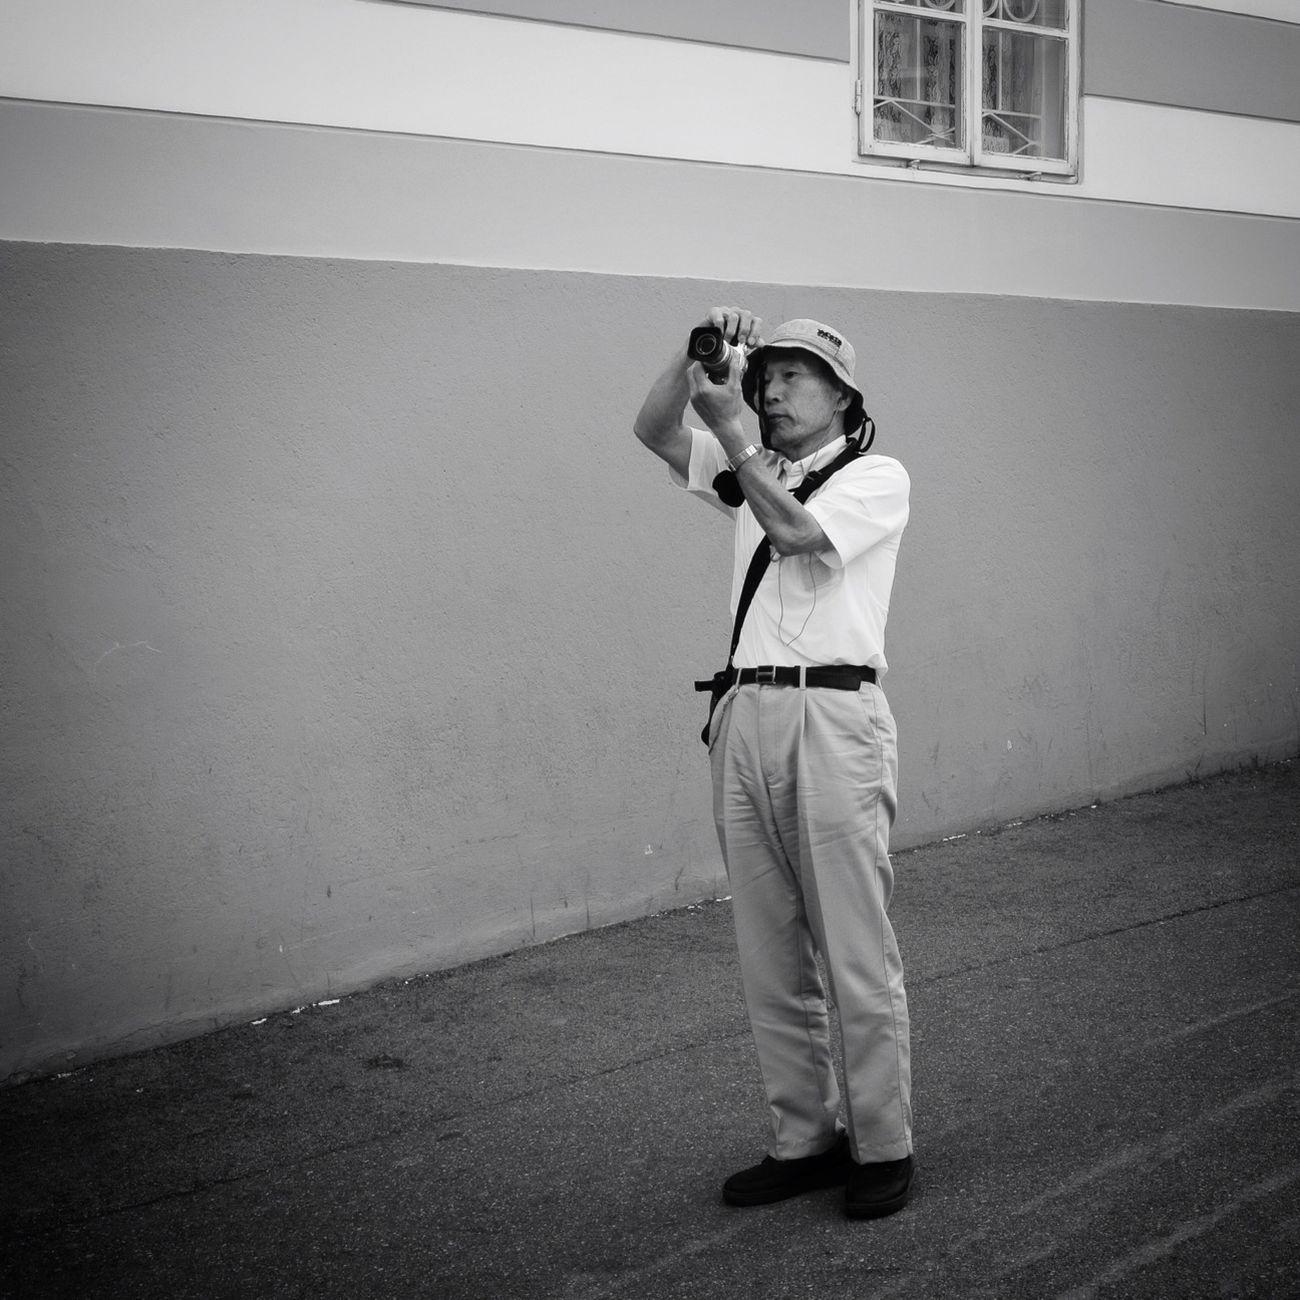 Shooting the shooter Blackandwhite Nikon 1 V1 Taking Photos Of People Taking Photos